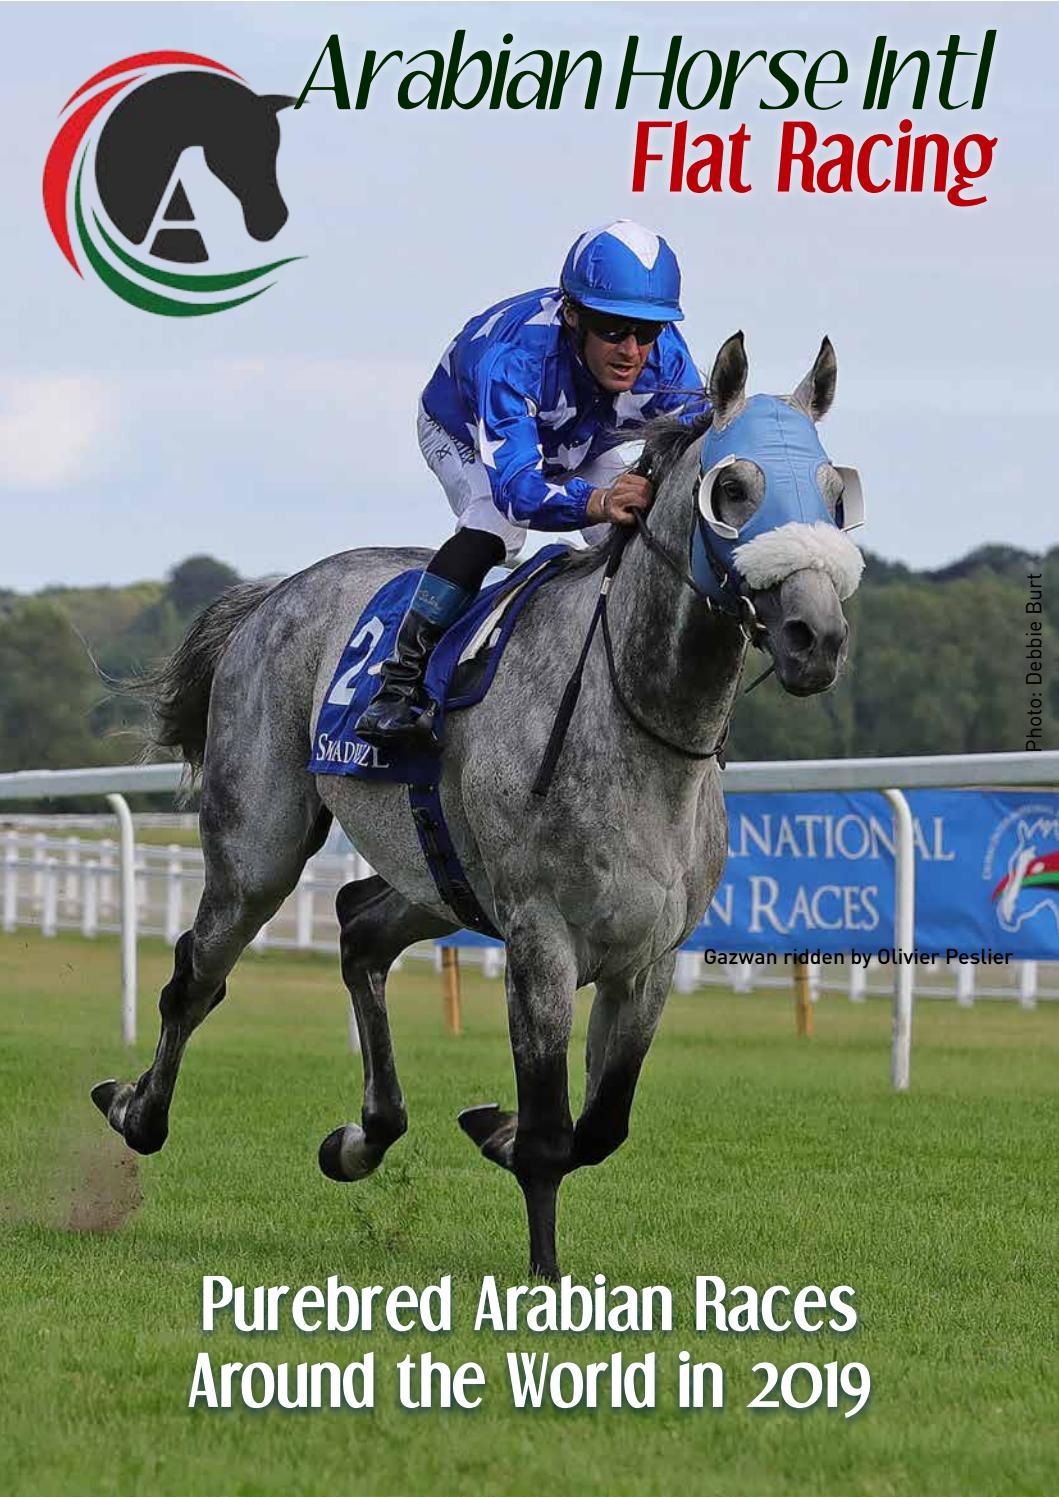 Arabian Horse Intl Flat Racing Purebred Arabian Races Around The World 2019 By Arabianhorseintl Issuu